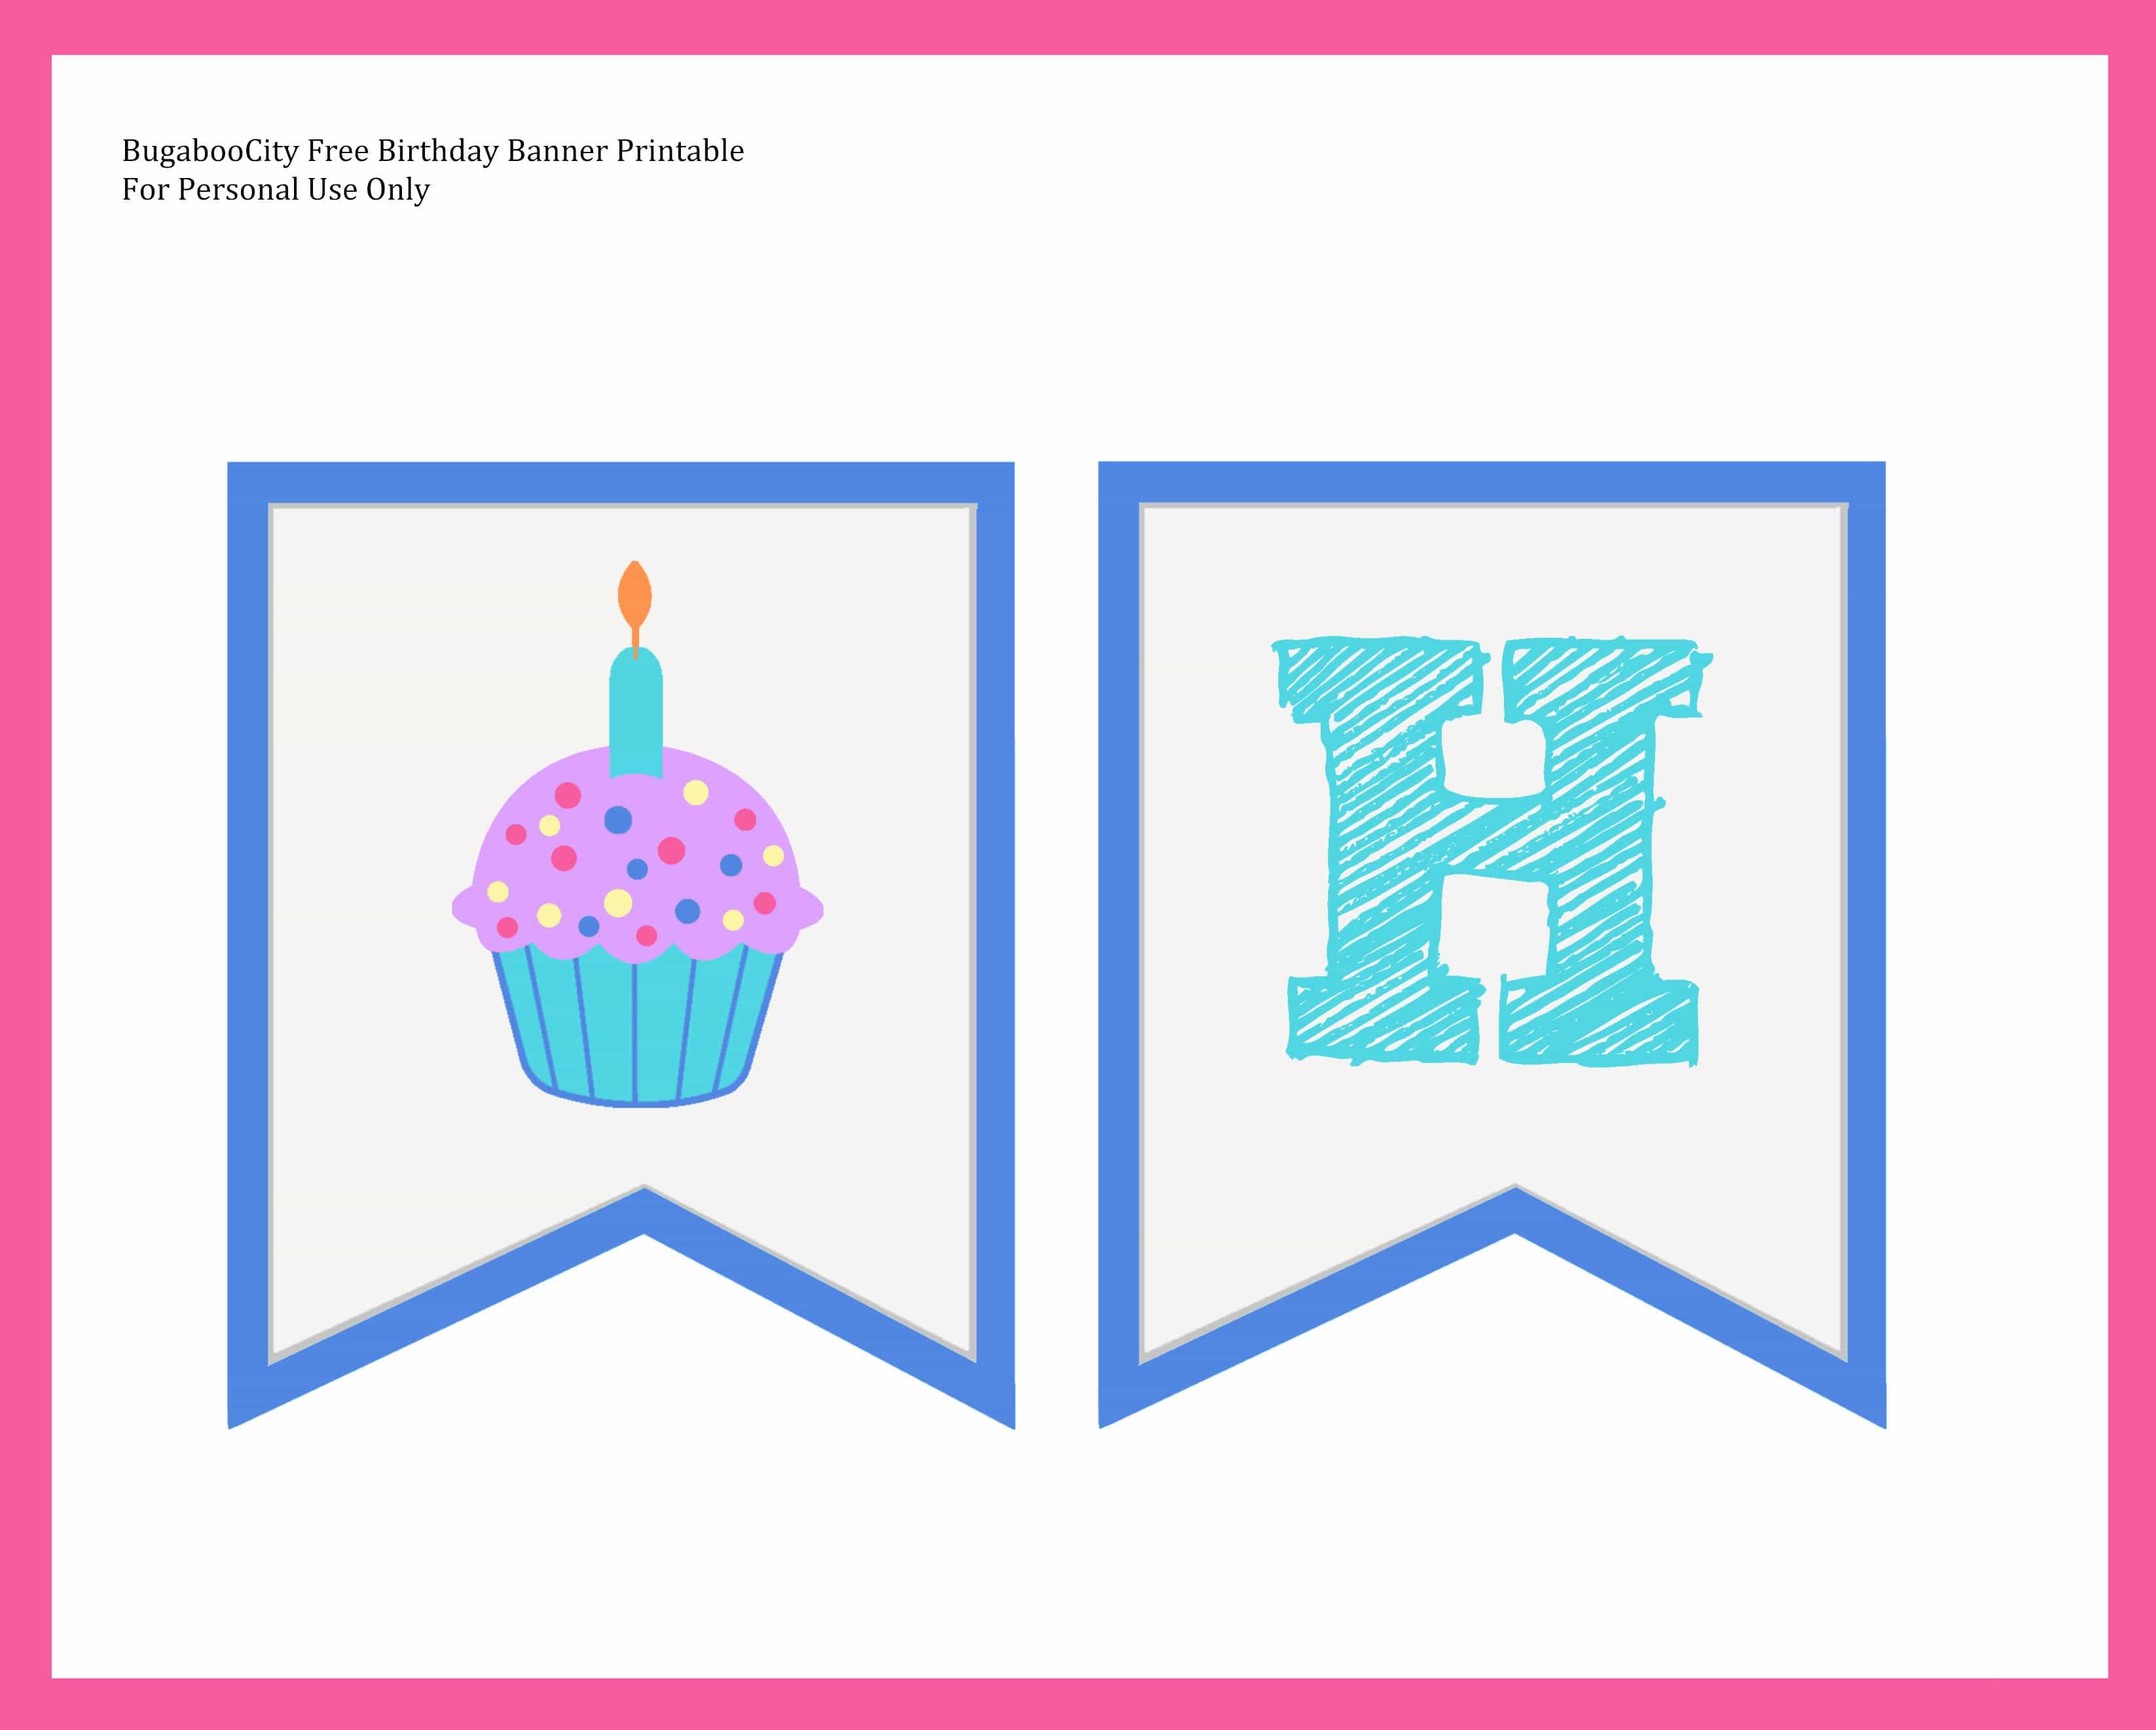 Free birthday banner images - Microsoft Word Bugaboocitybirthdaybanner Docx